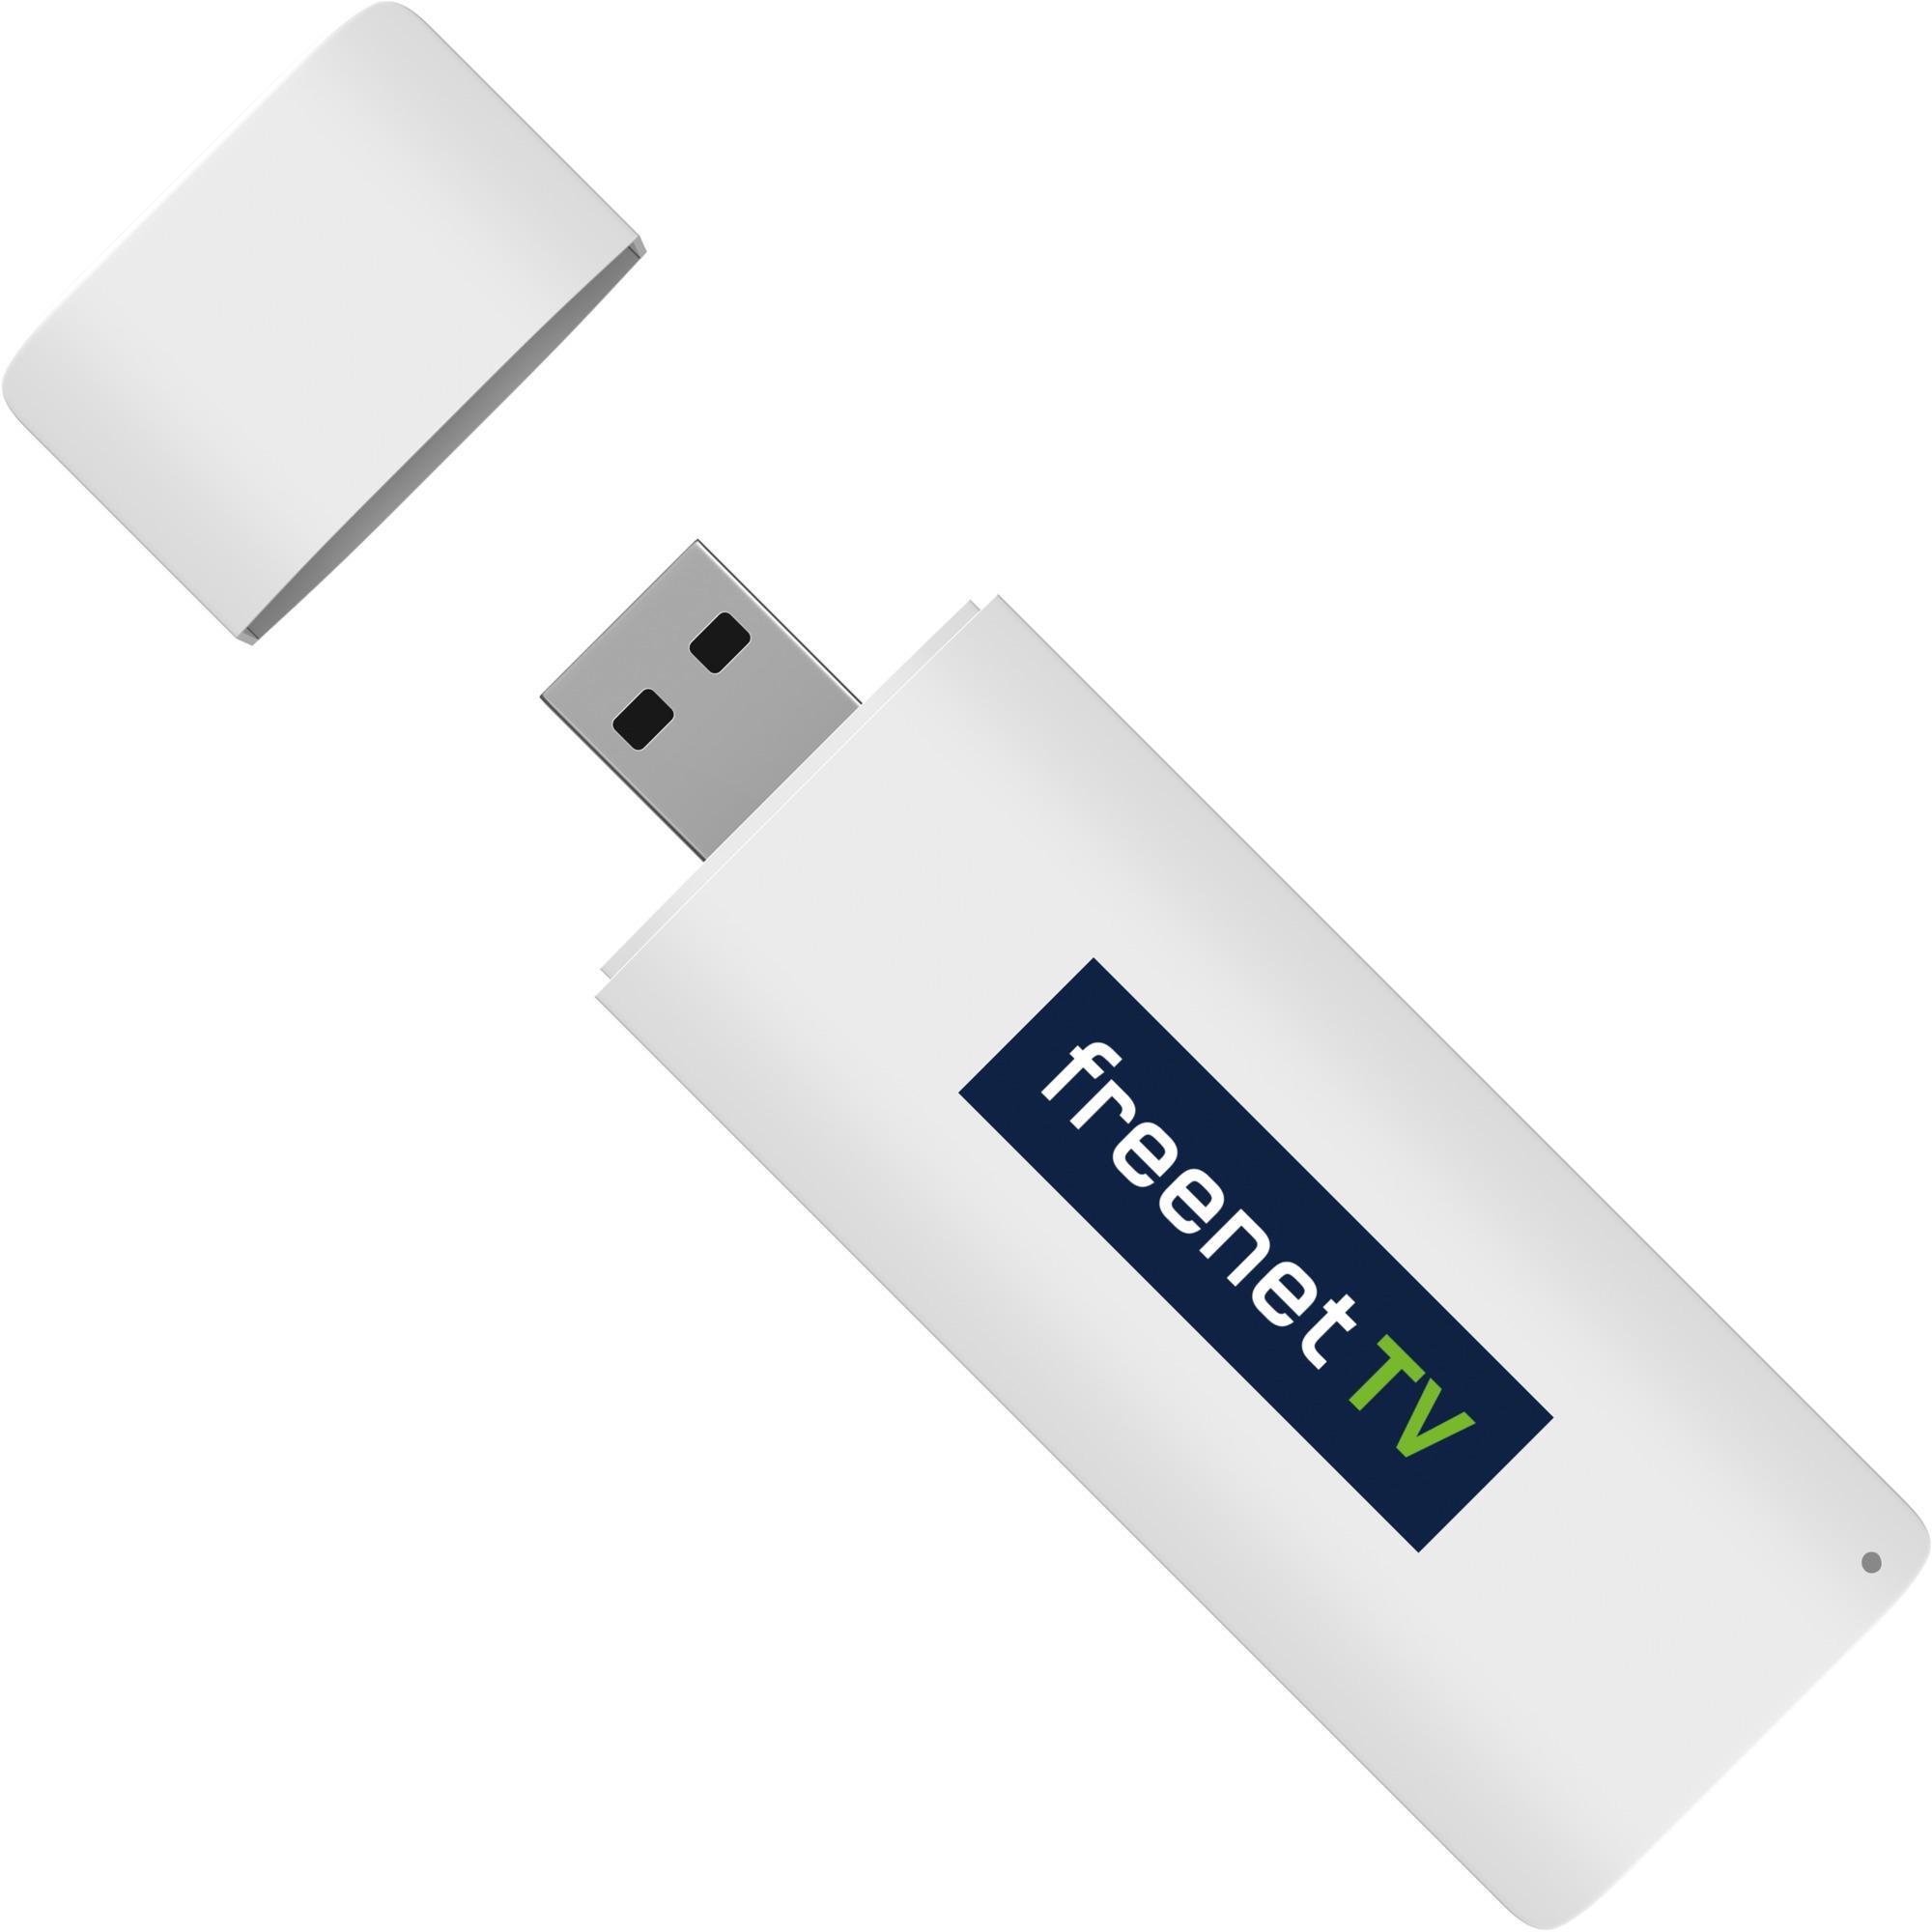 100100 DVB-T2 USB récepteur TV, Antenne